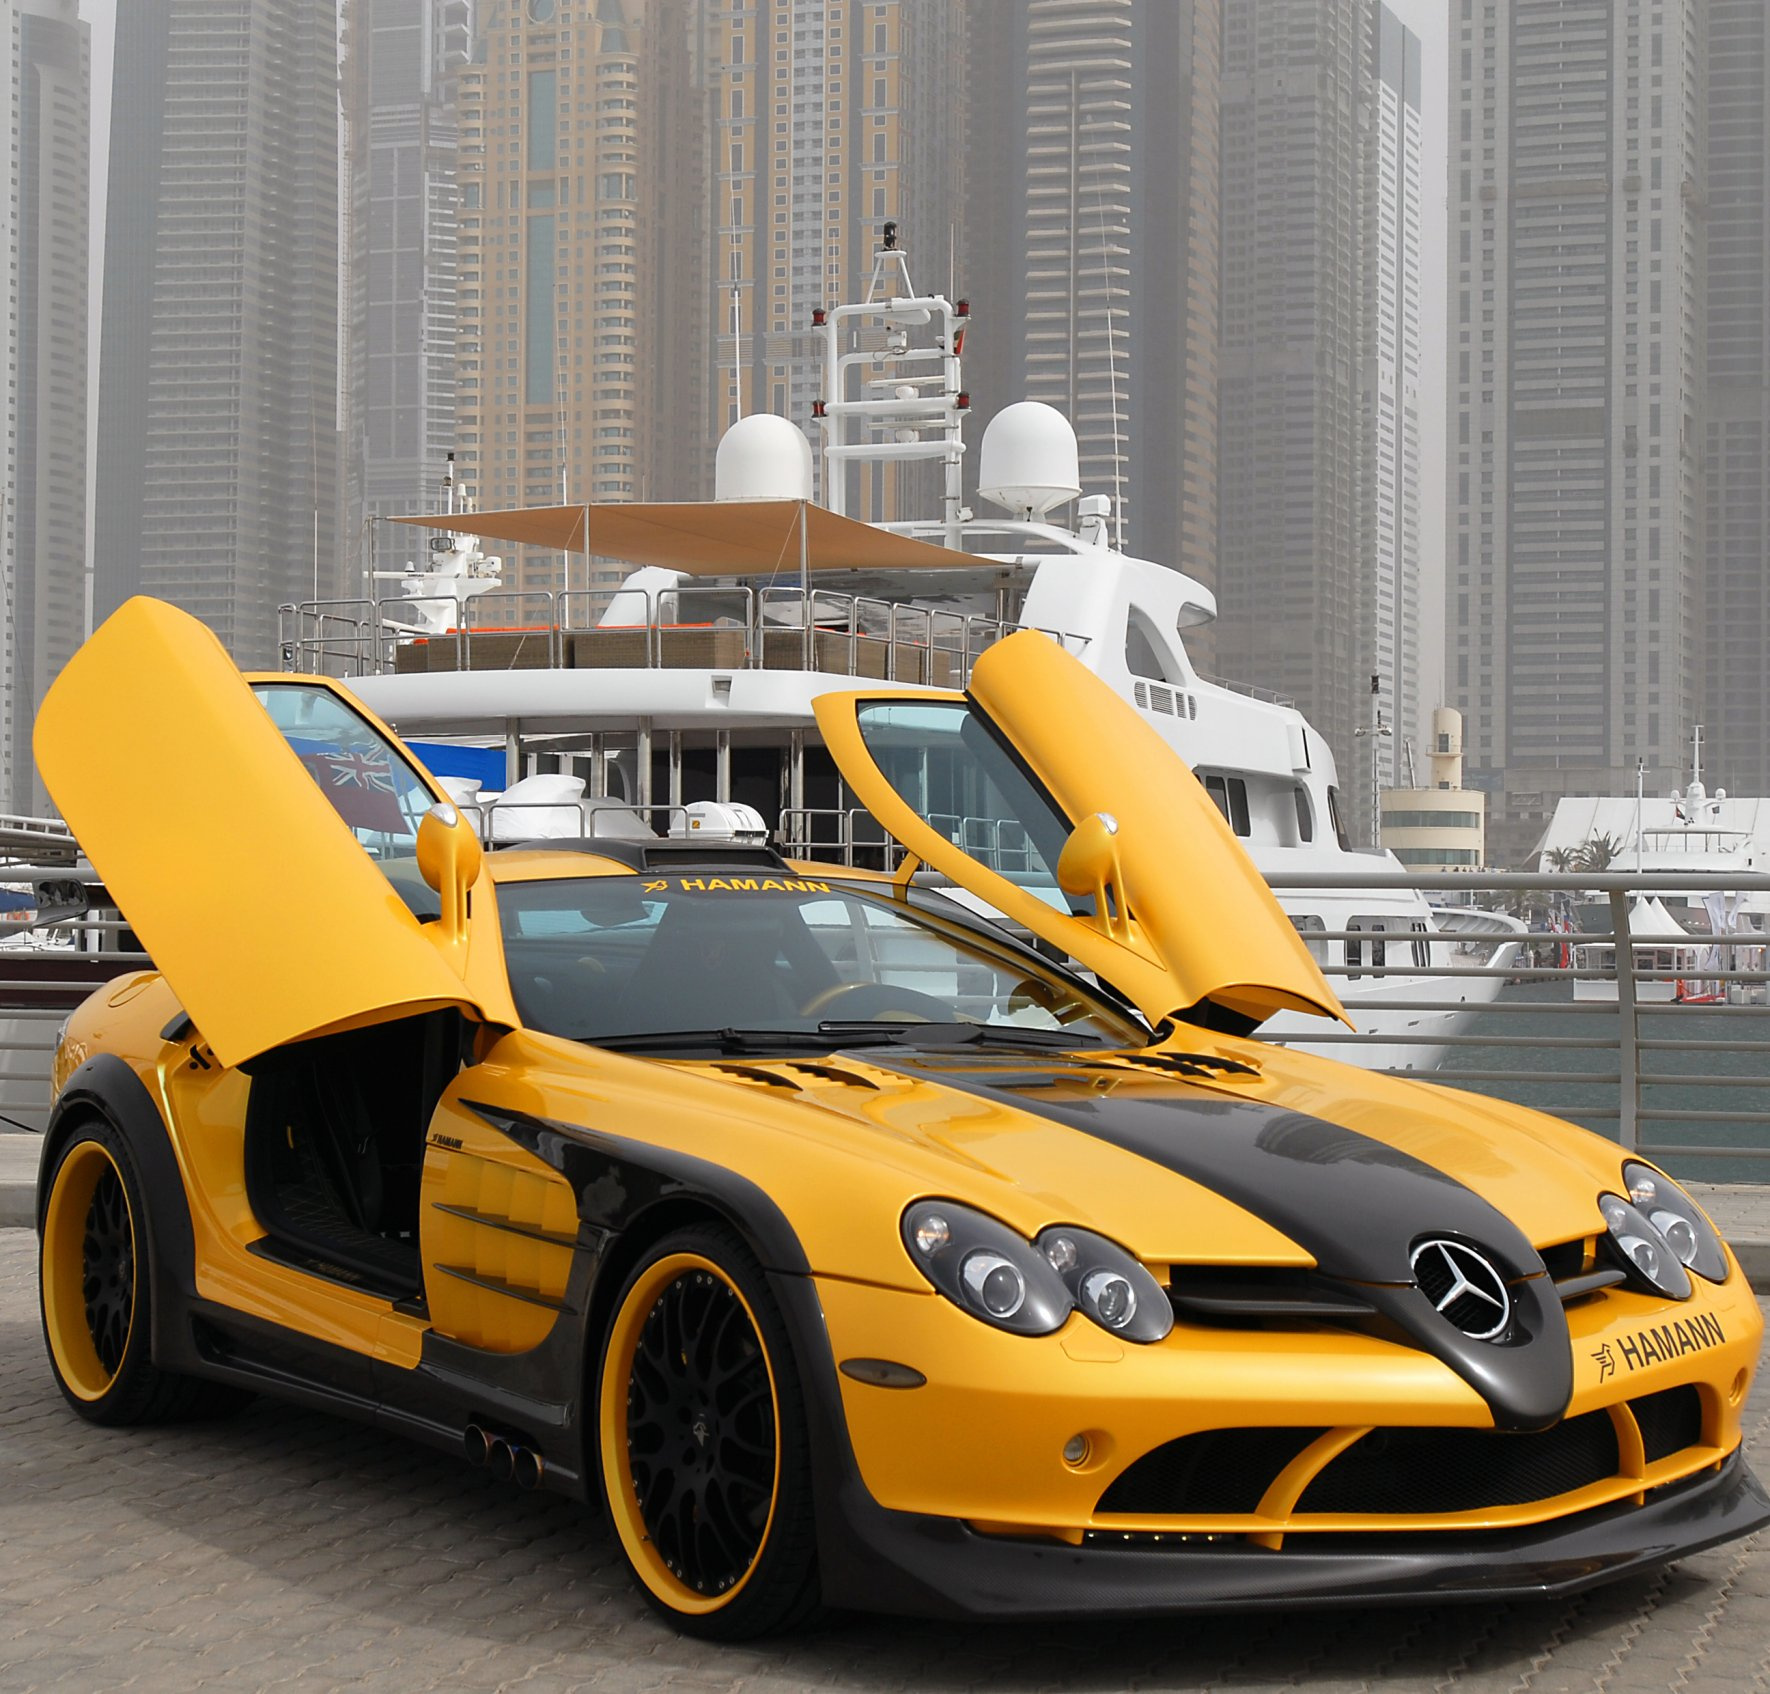 Dubai Boat Show Hosts First Supercar Superyachts Com